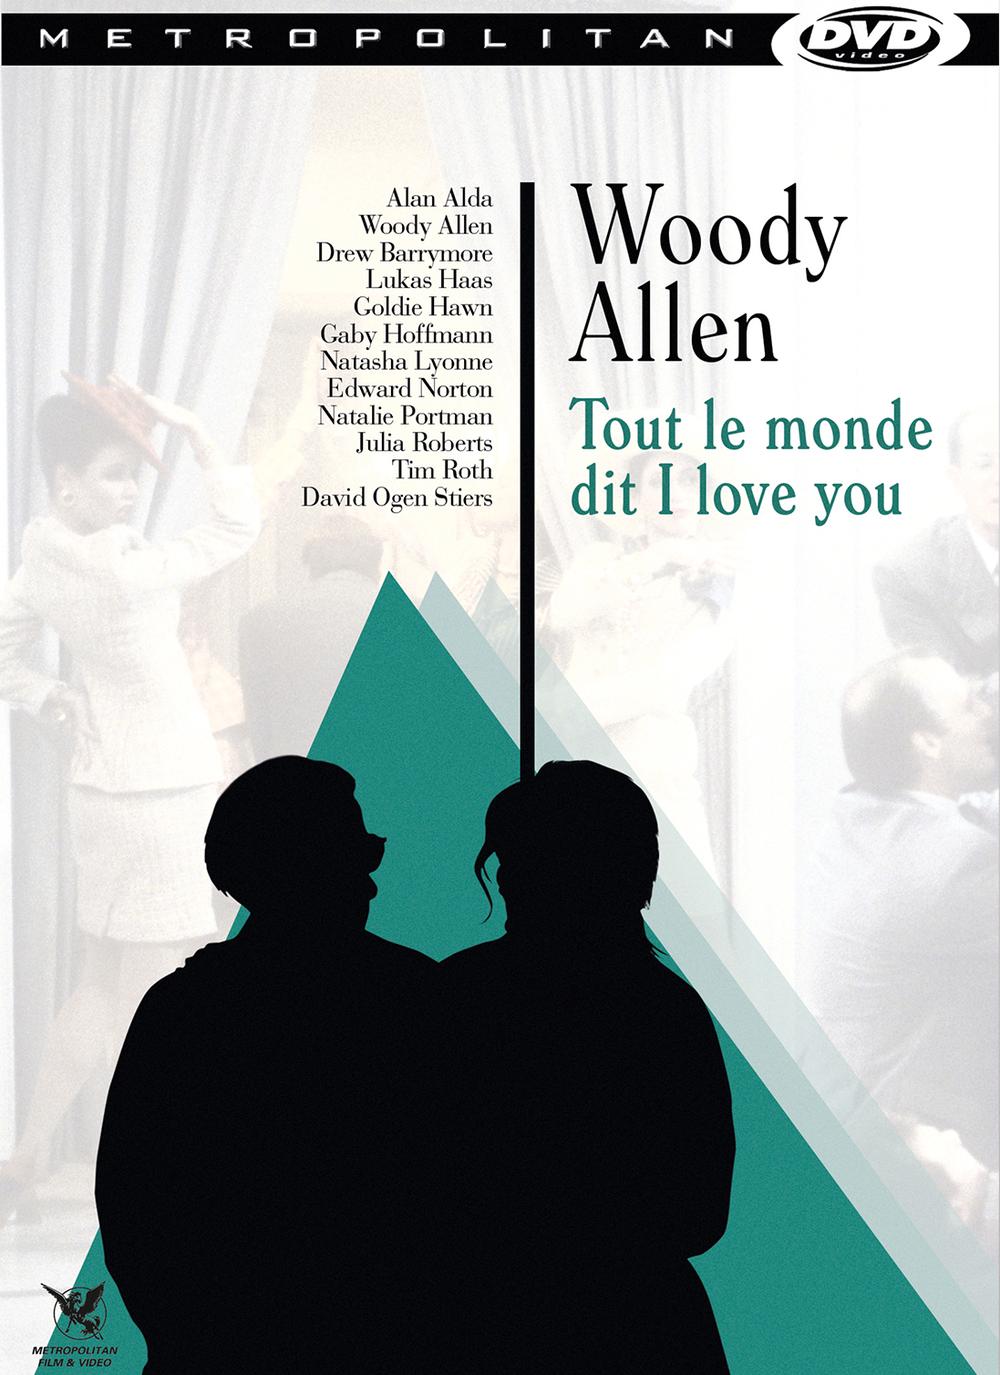 silentnoise - Woody allen